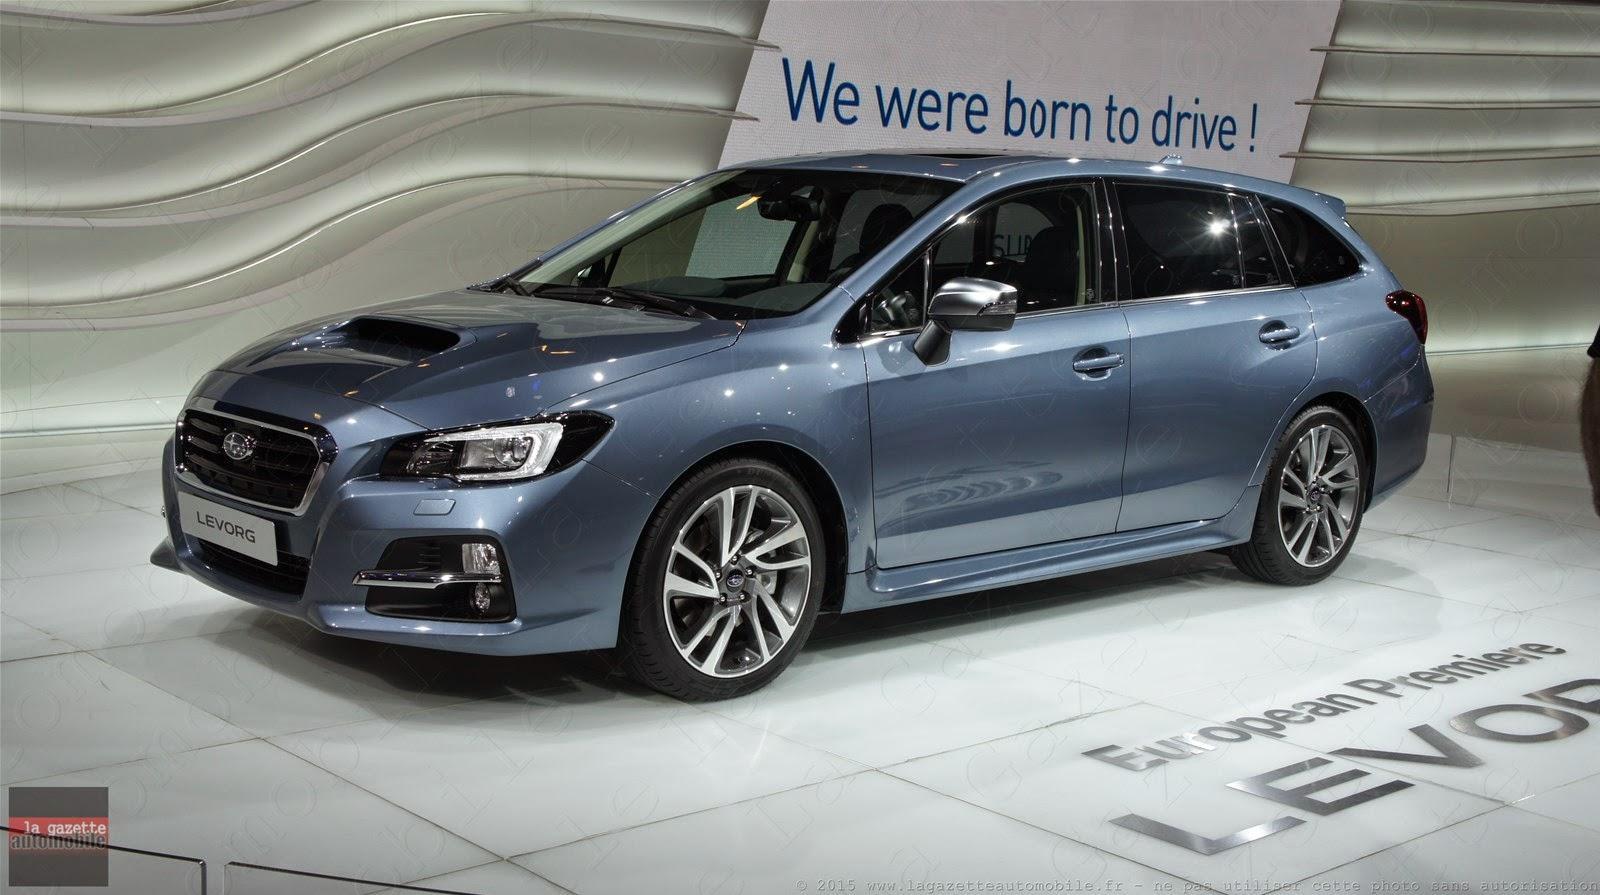 Genève 2015 Subaru Levorg